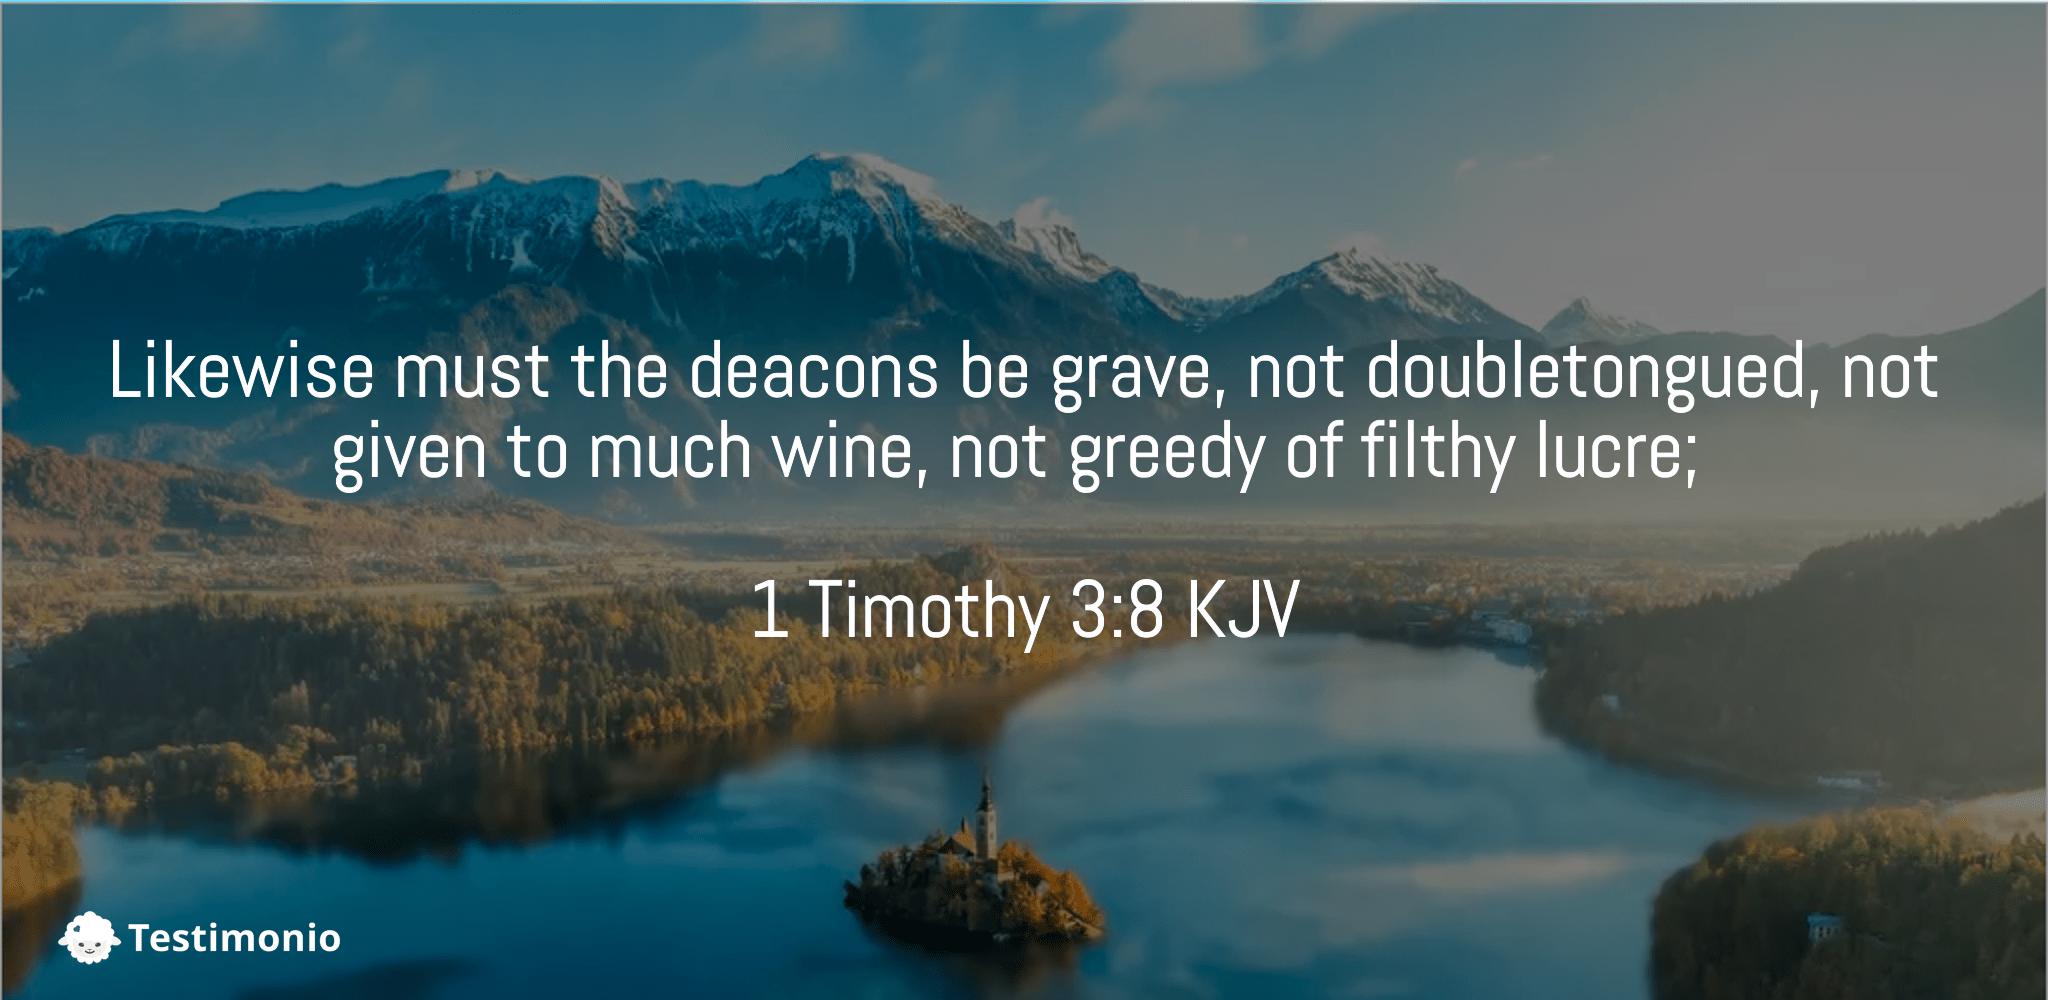 1 Timothy 3:8